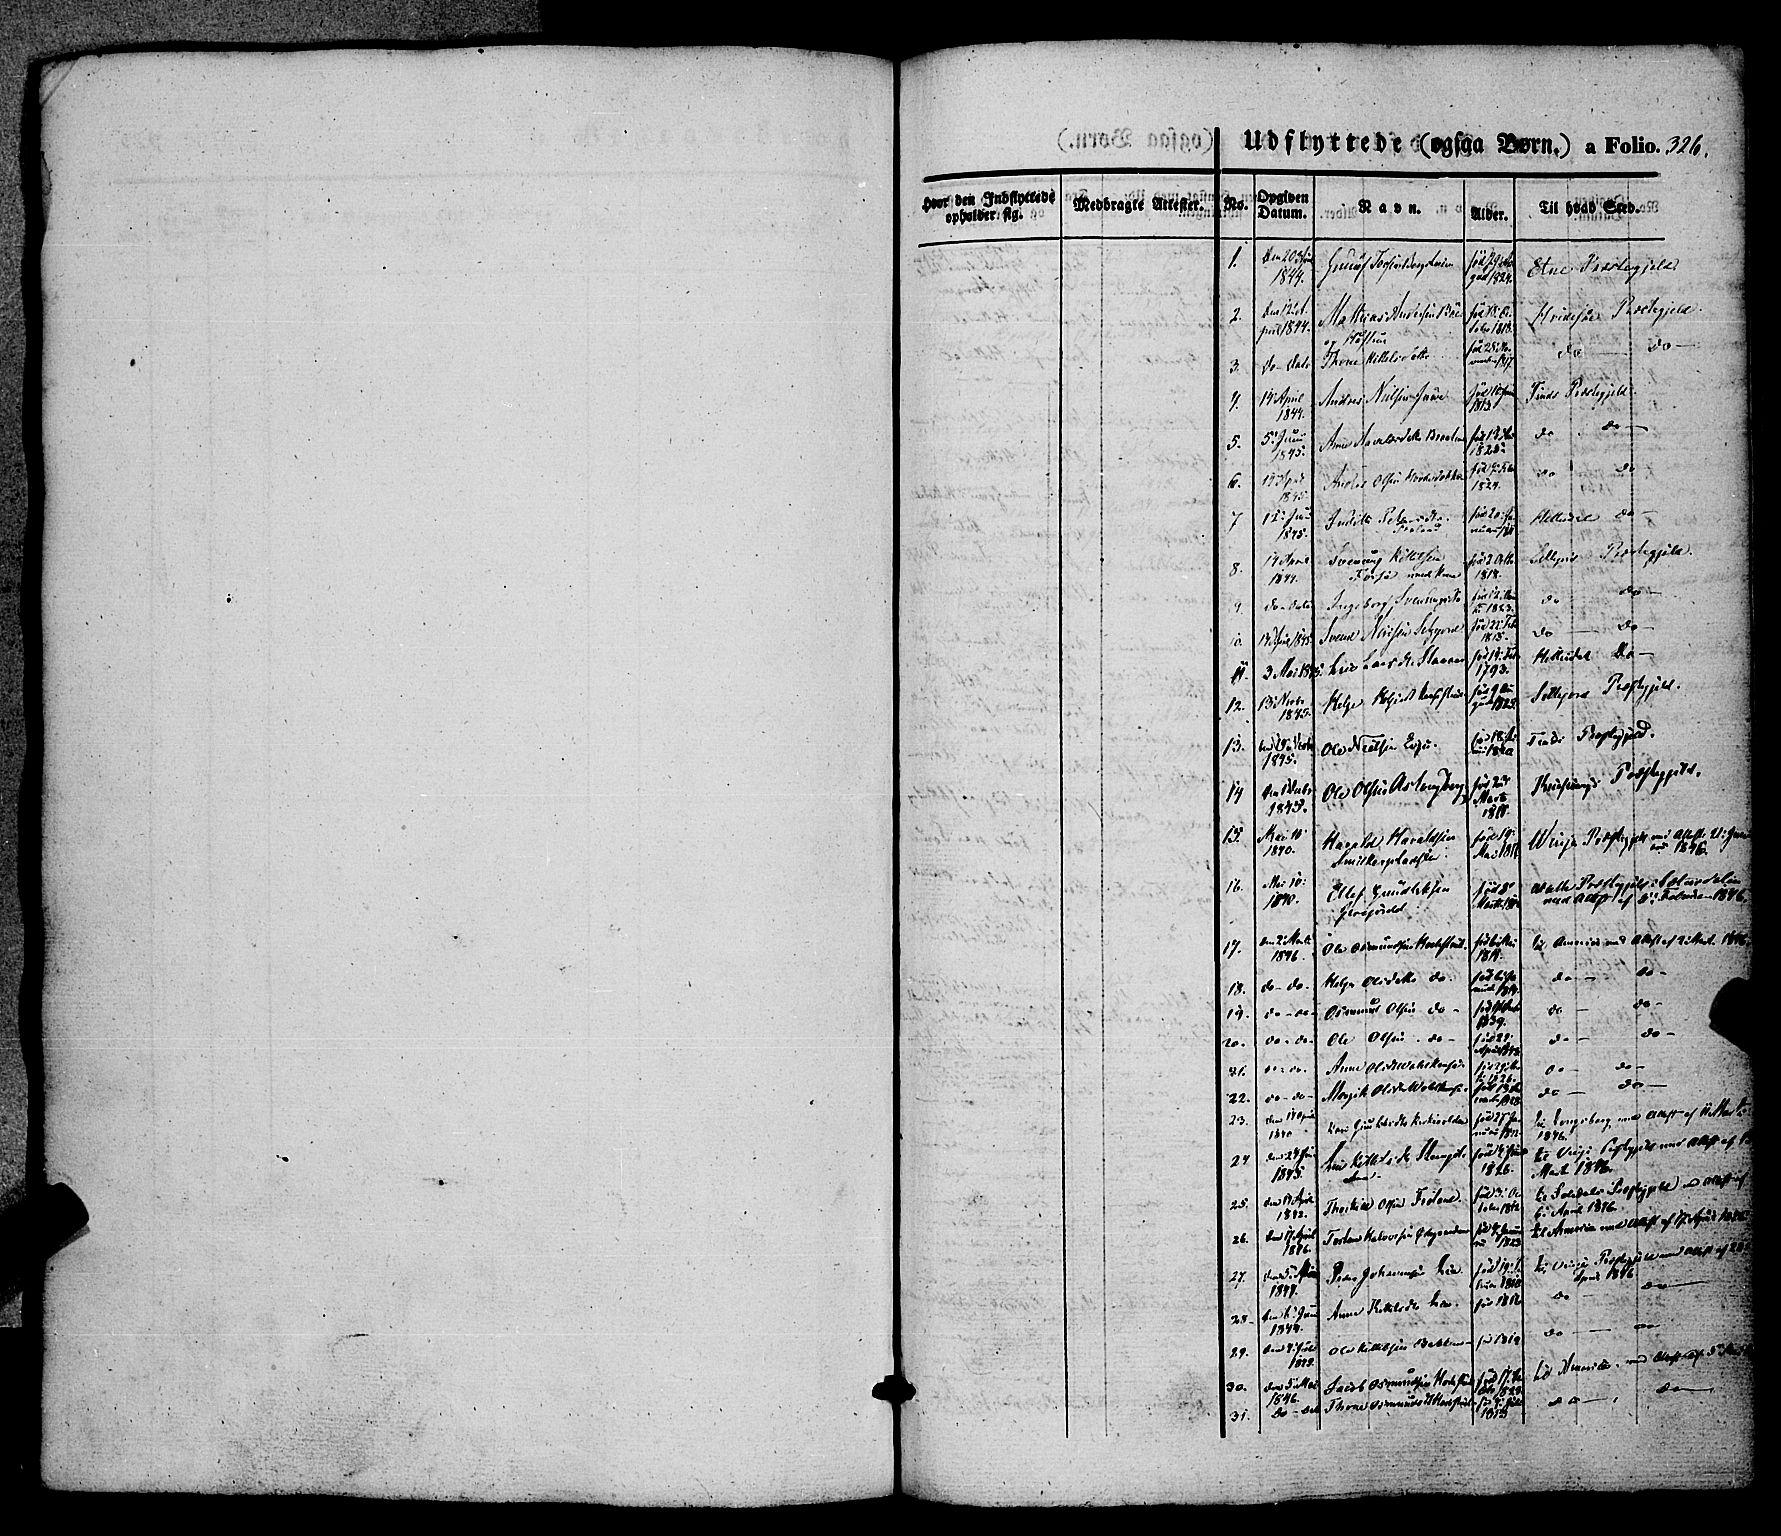 SAKO, Hjartdal kirkebøker, F/Fa/L0008: Ministerialbok nr. I 8, 1844-1859, s. 326